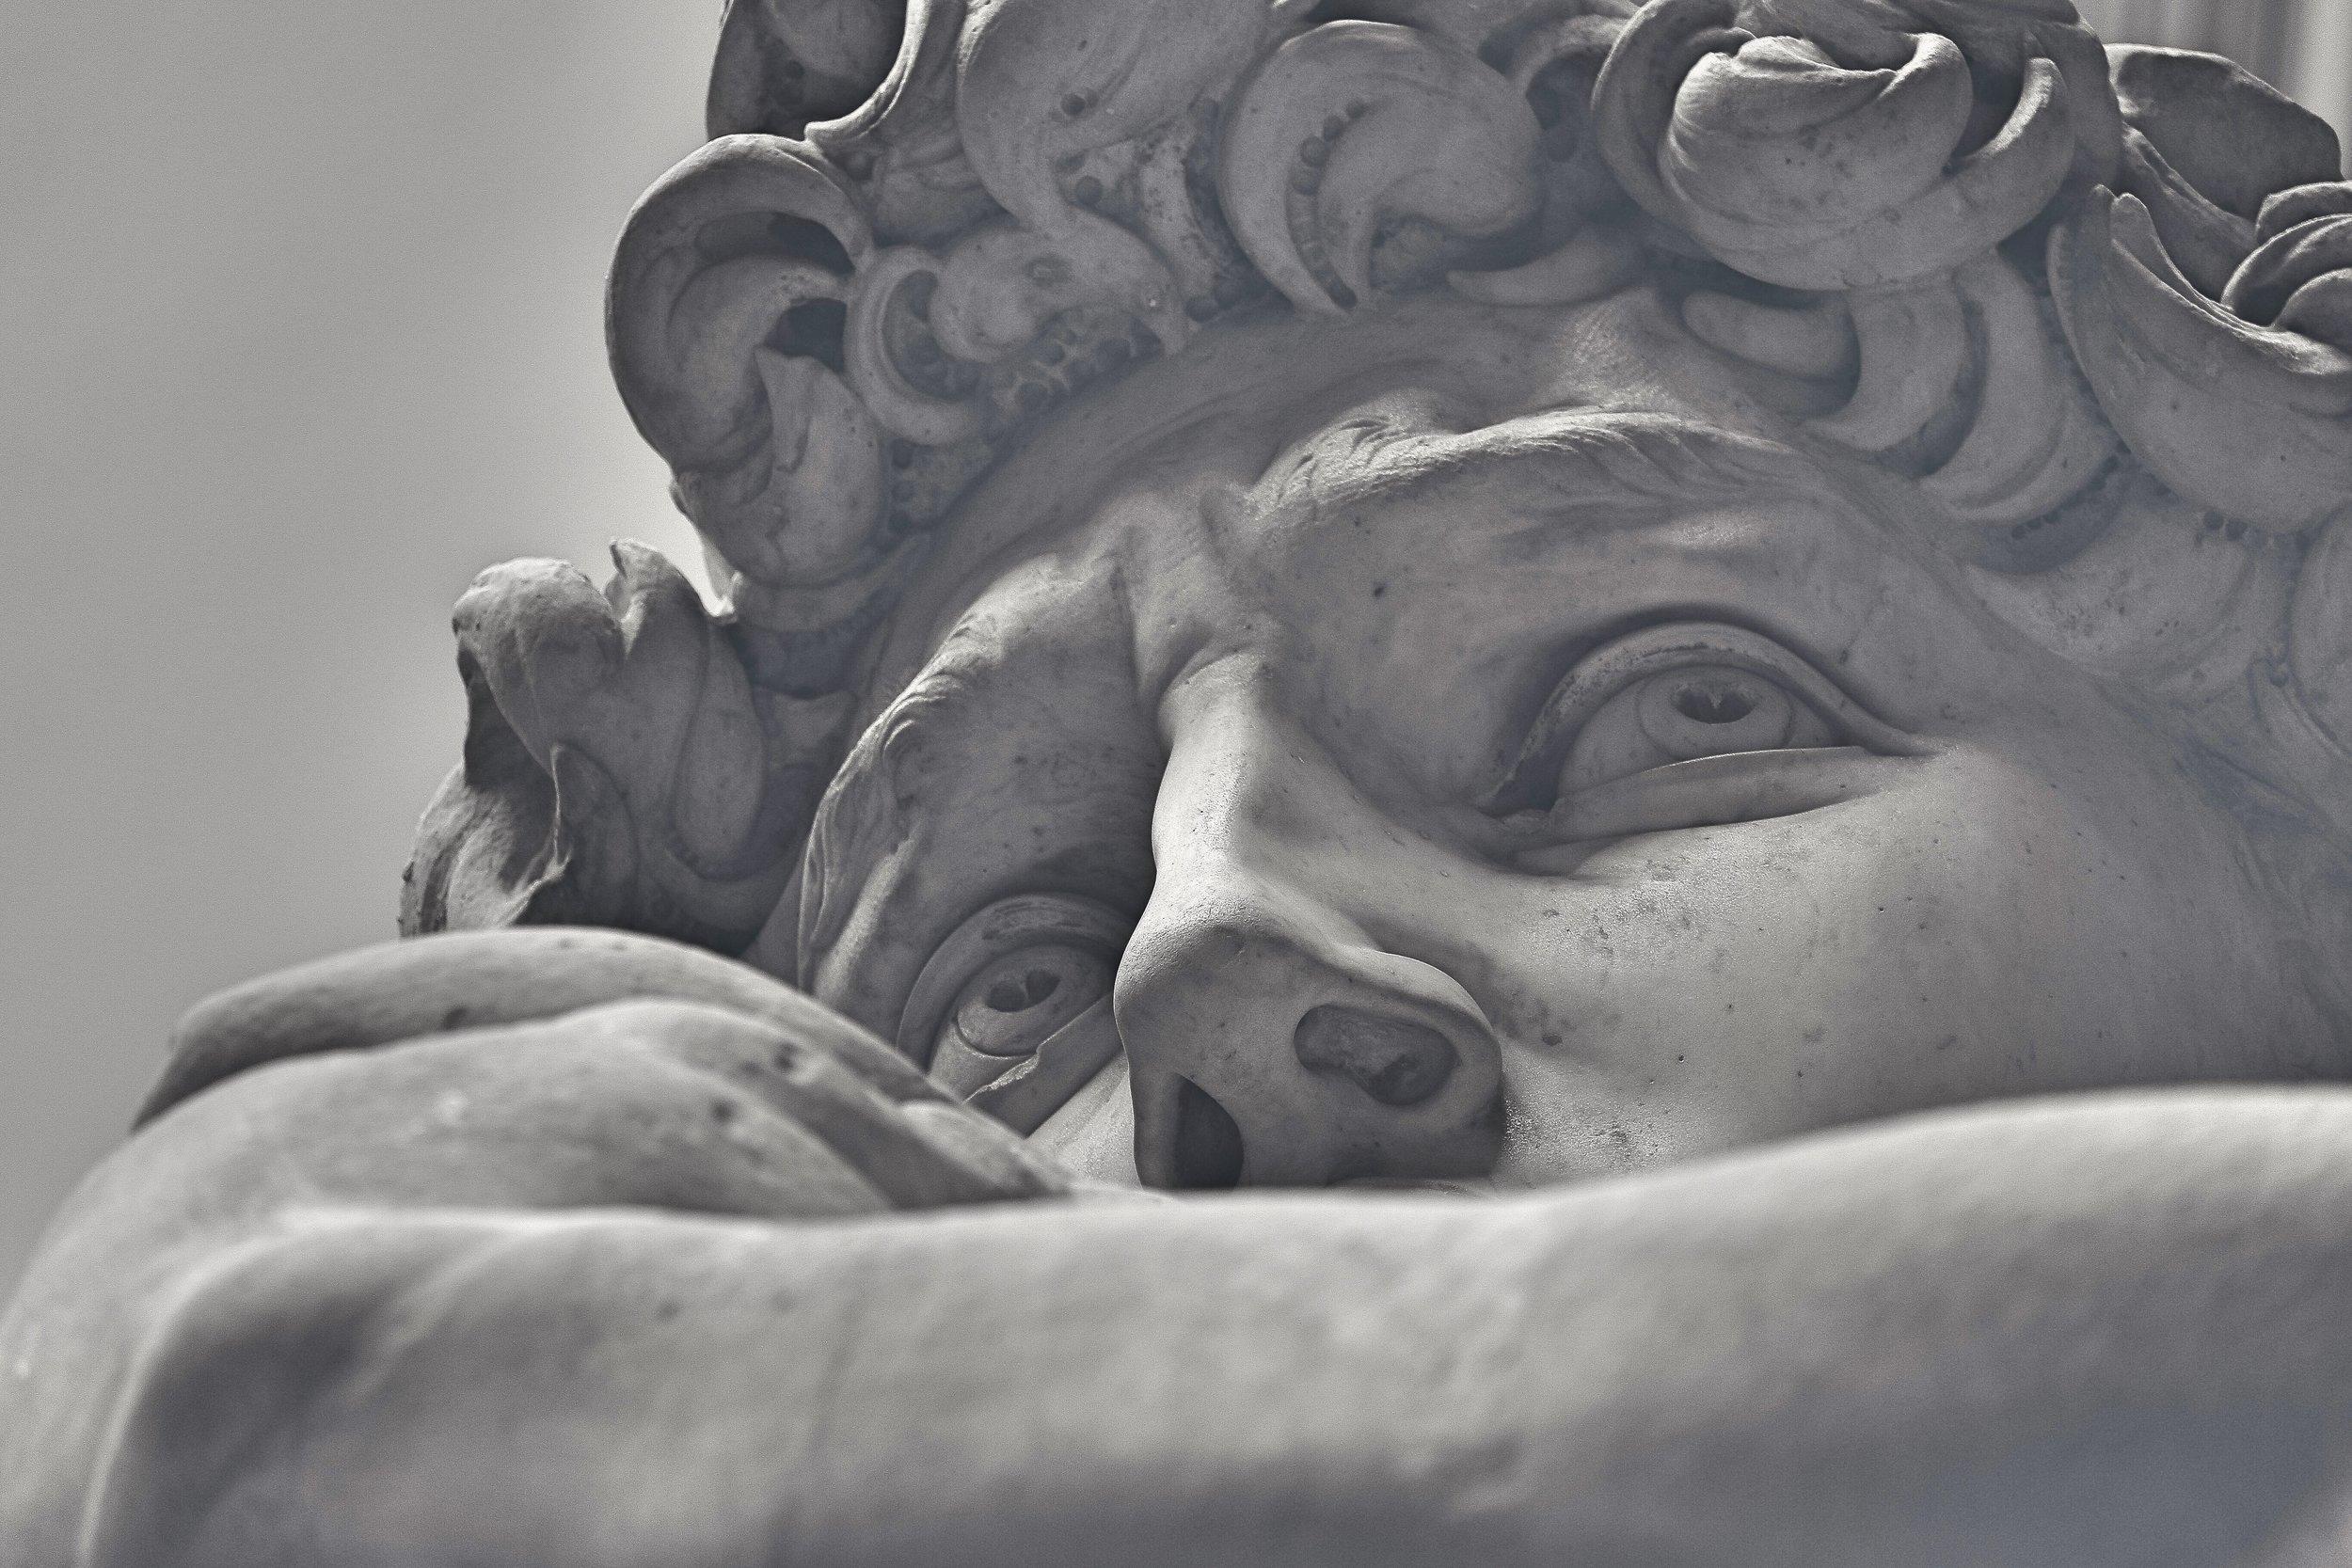 inspiration-michelangelo-david-florence-05.jpg